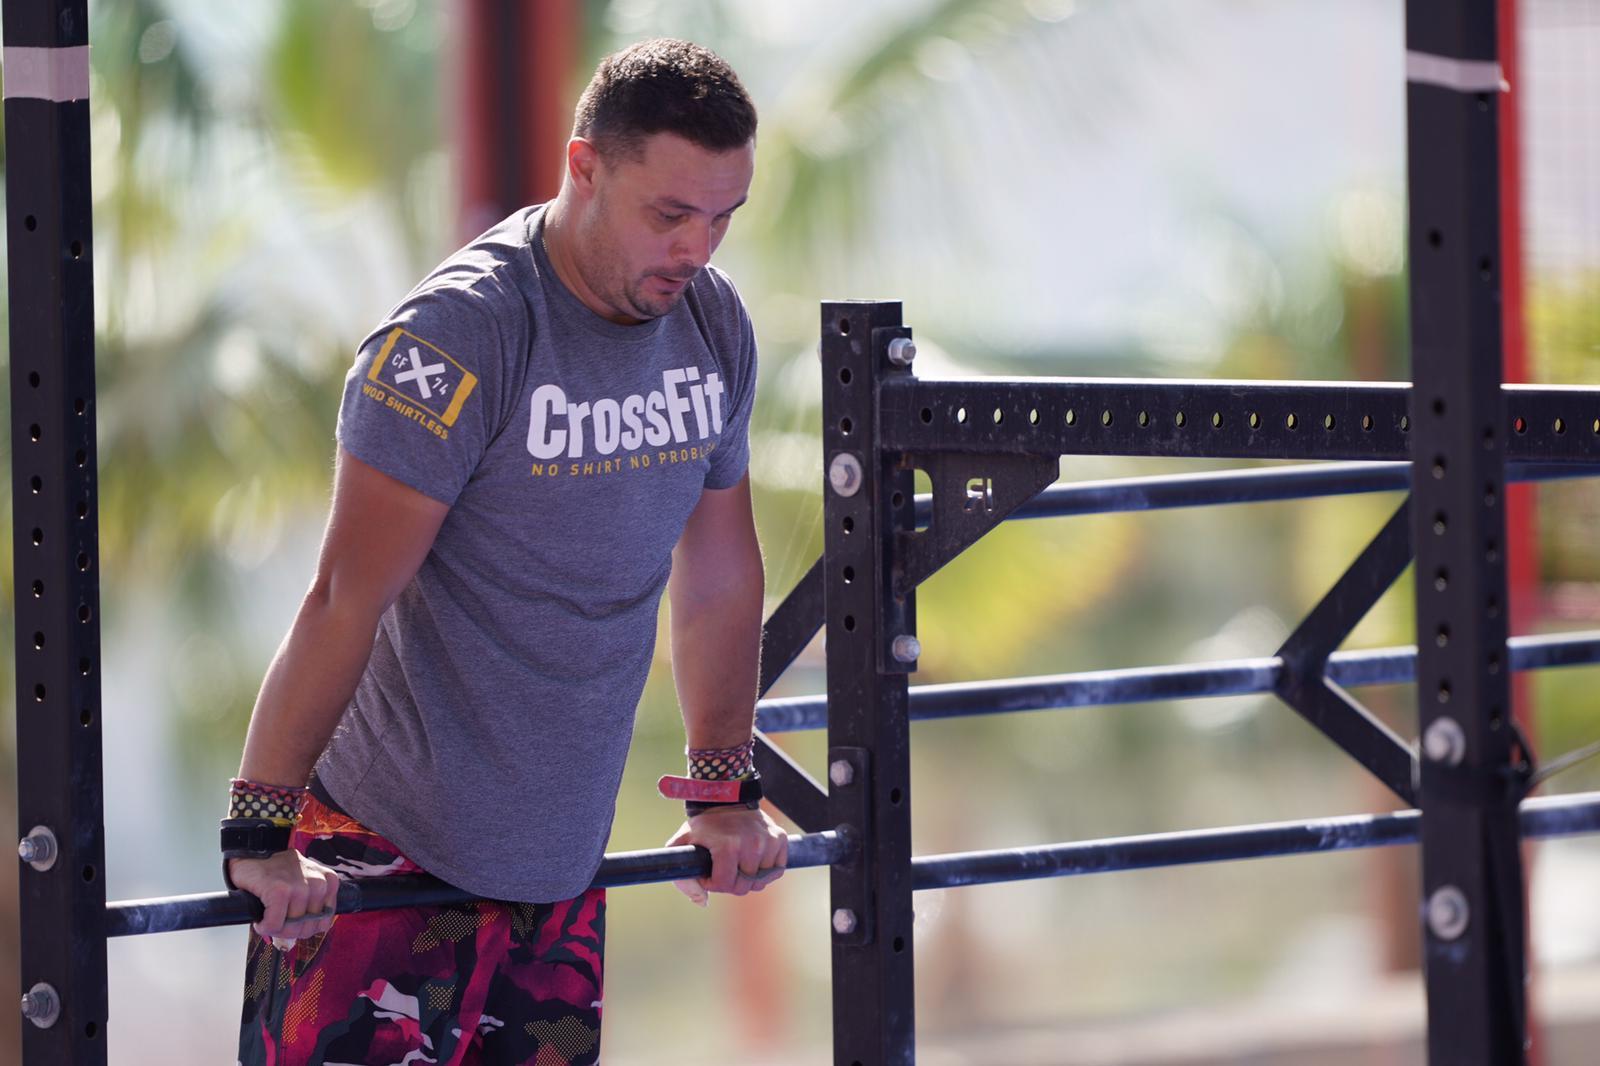 CrossFit Drop-in